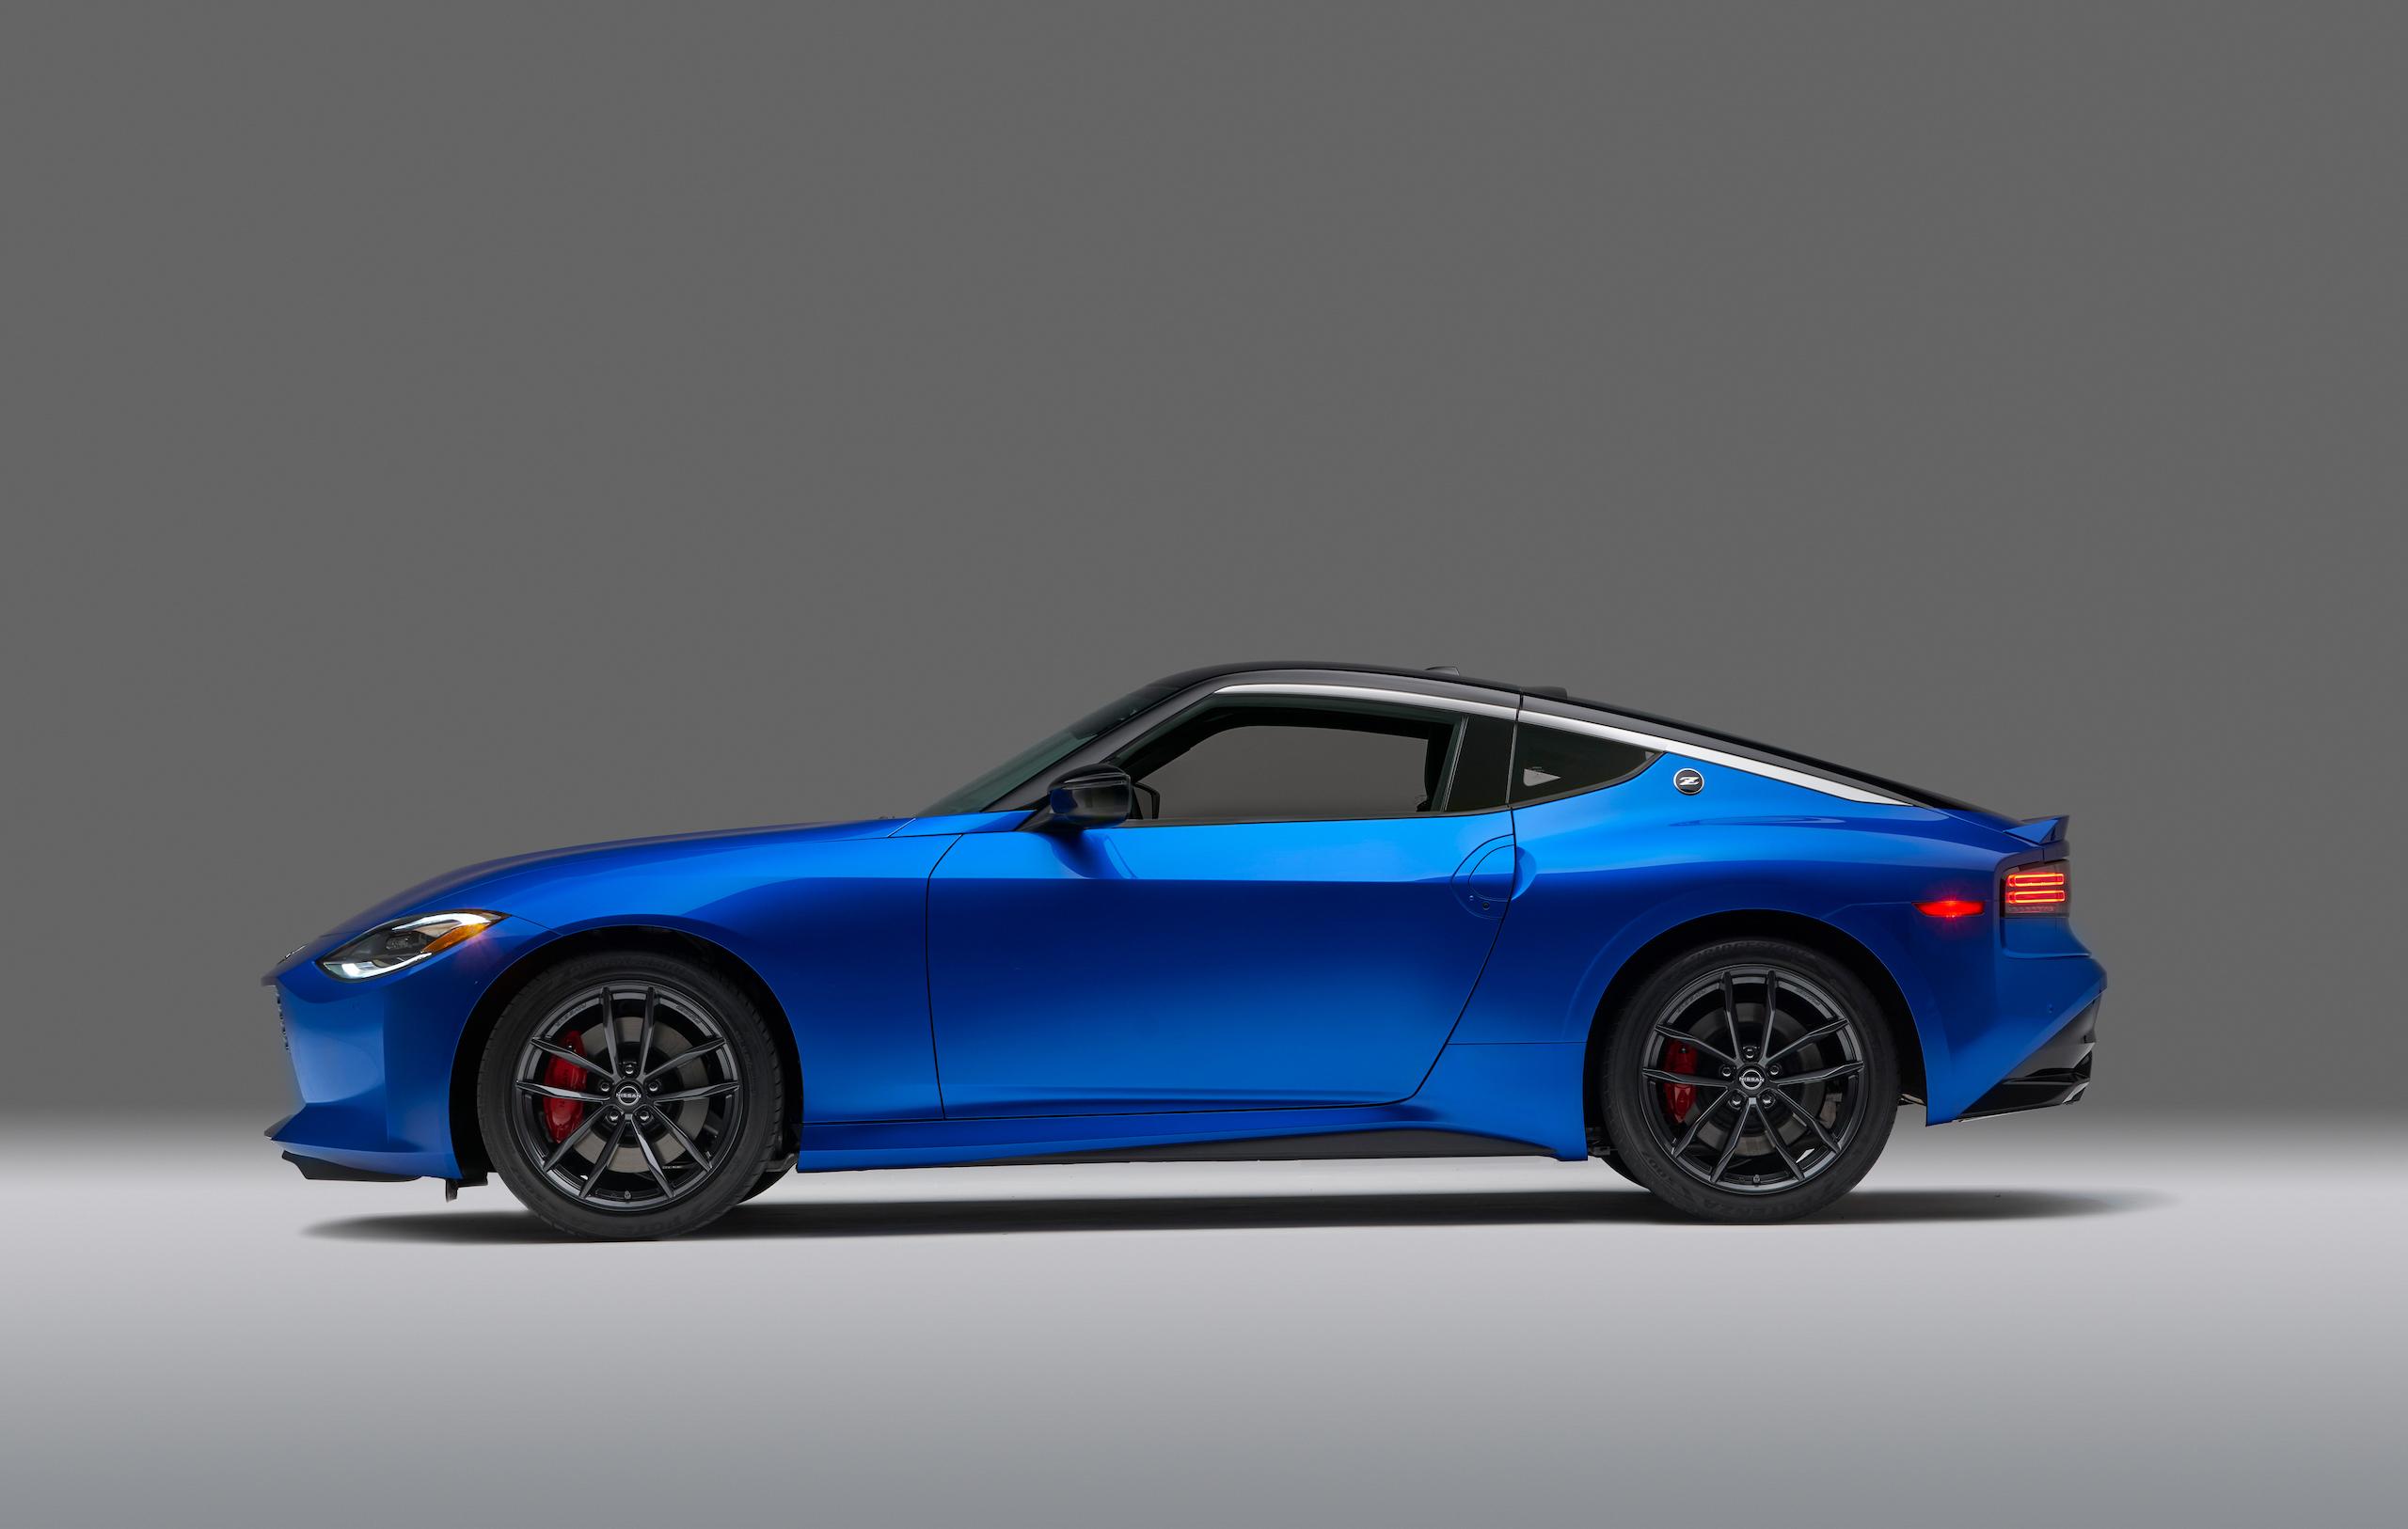 2023 Nissan Z side profile blue